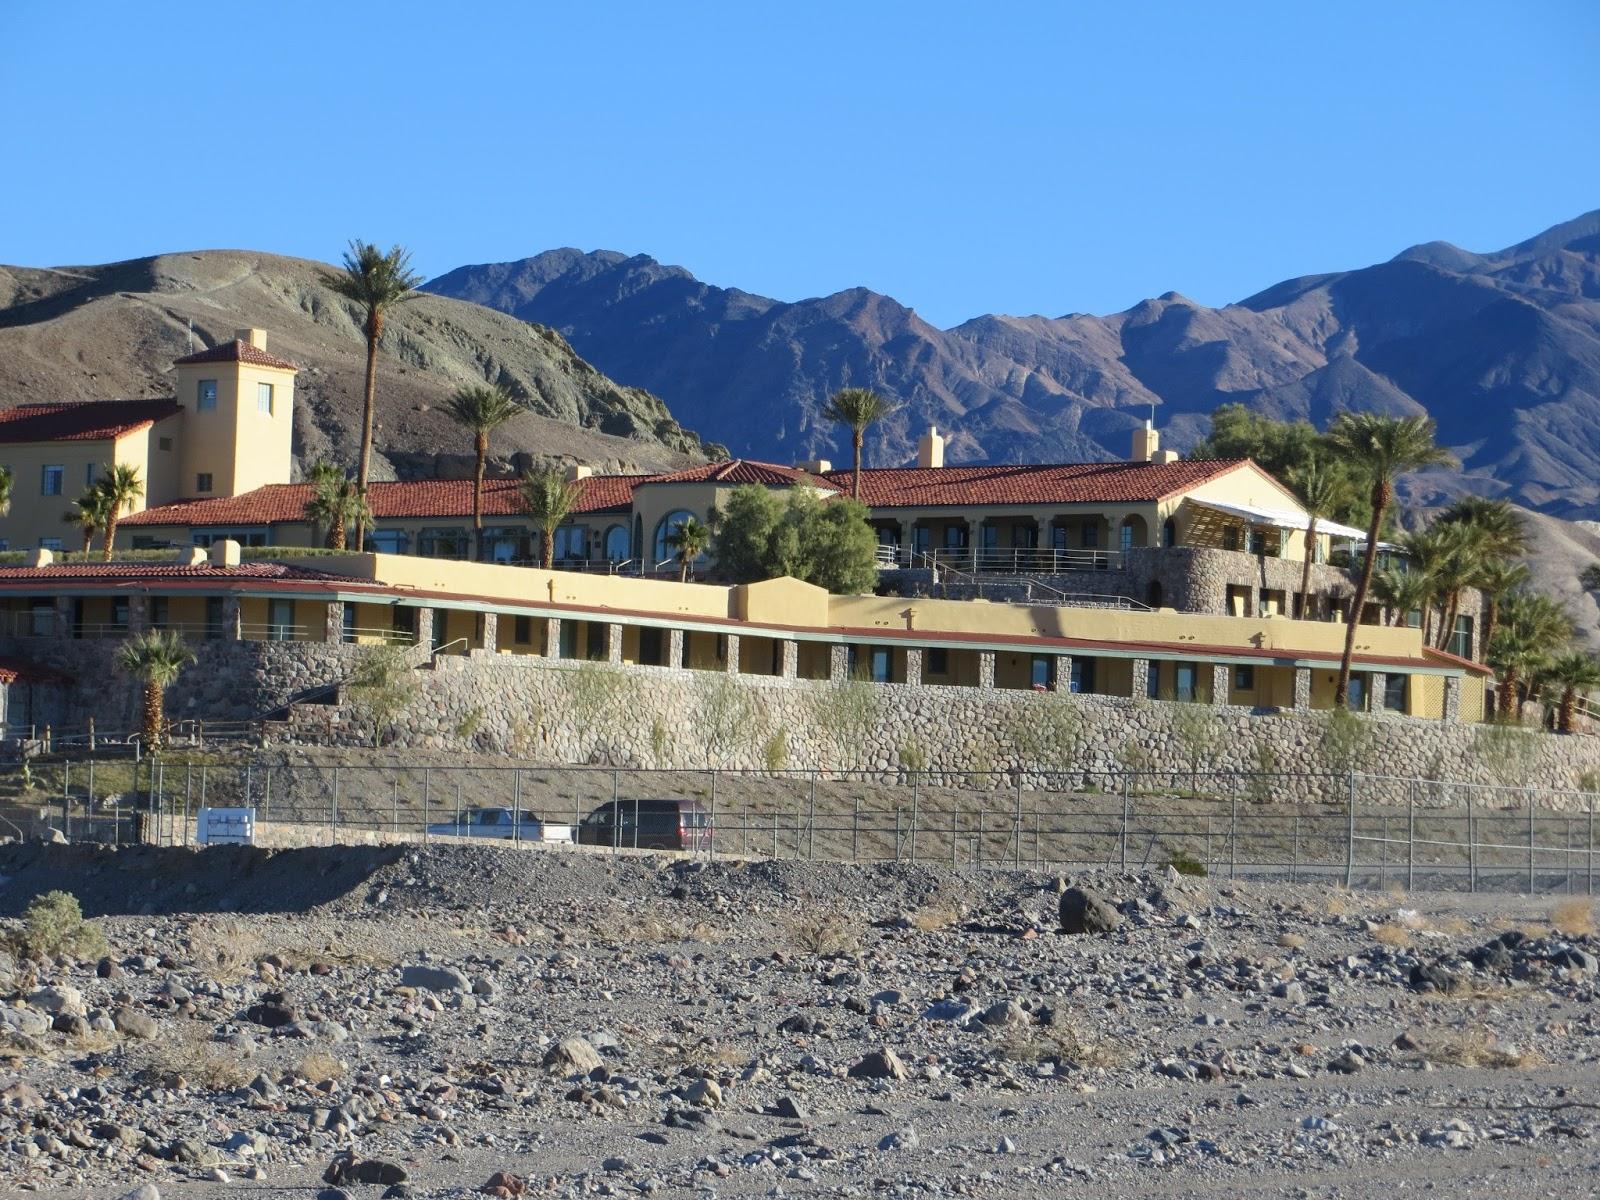 Marpeg Death Valley National Park Ca